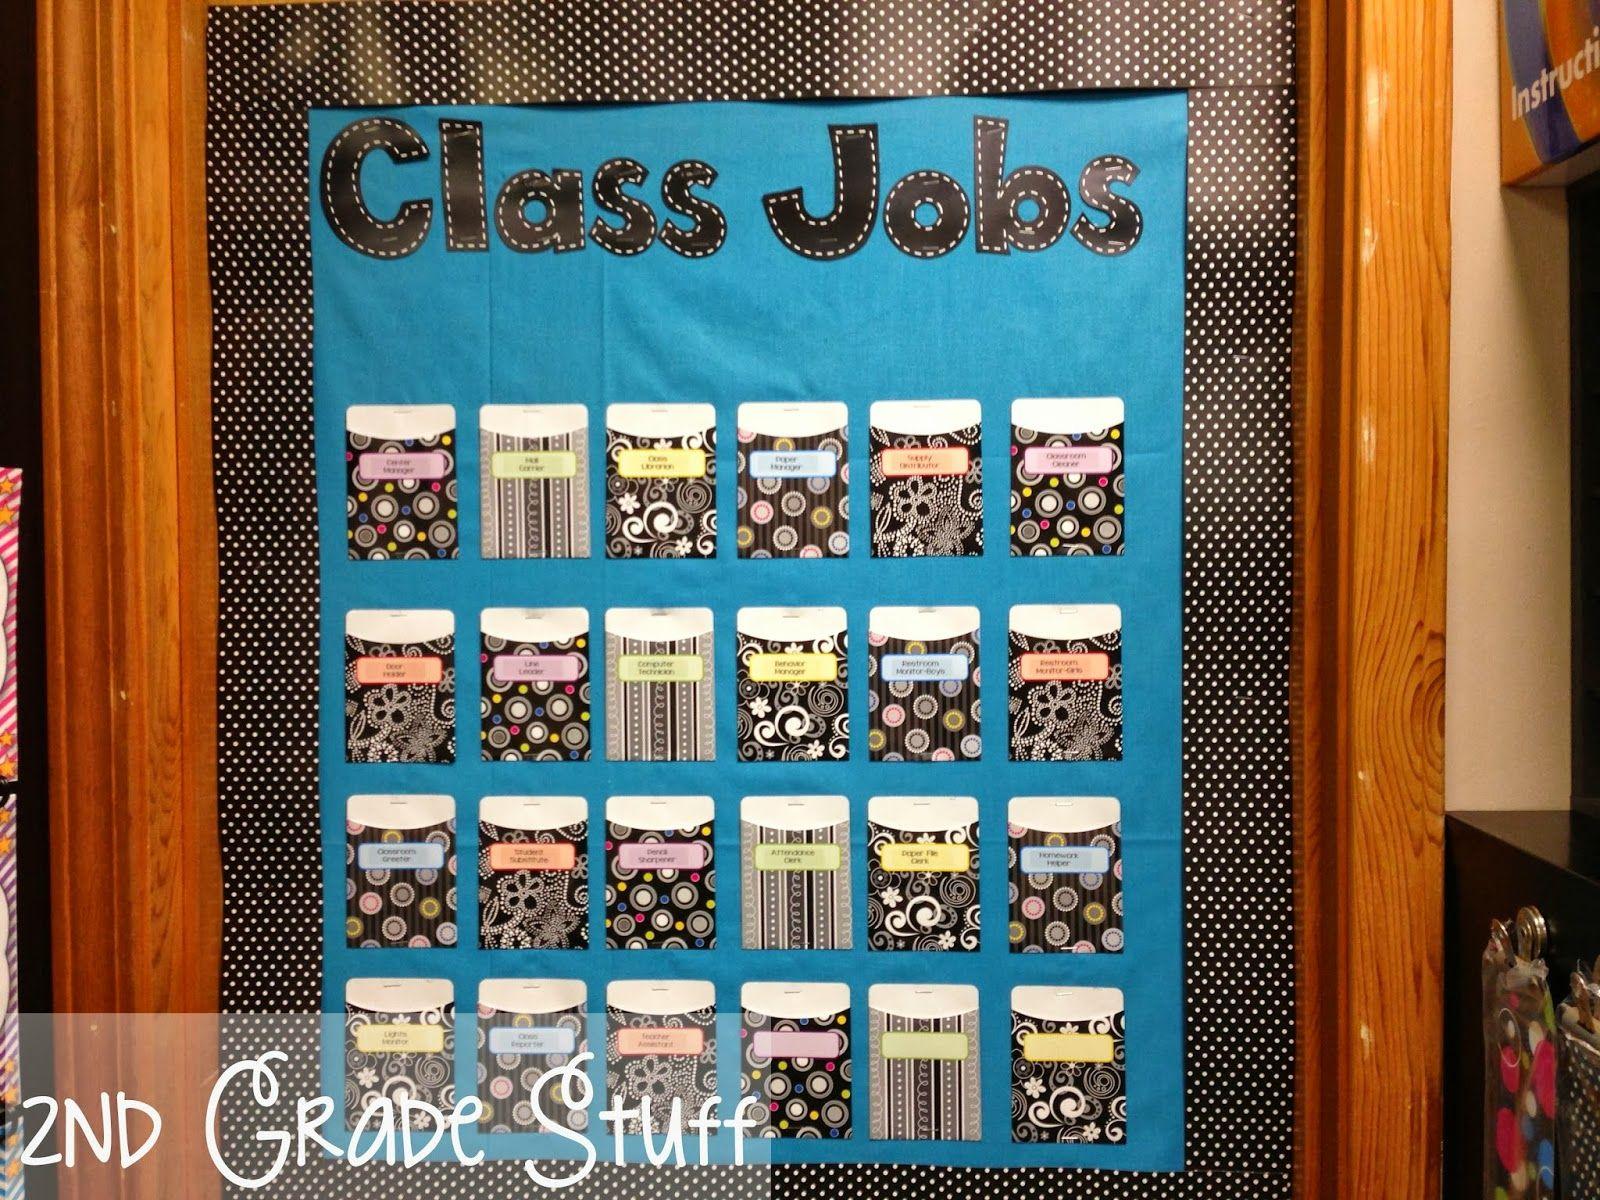 Classroom Ideas For 2nd Grade : Second grade classroom ideas google search